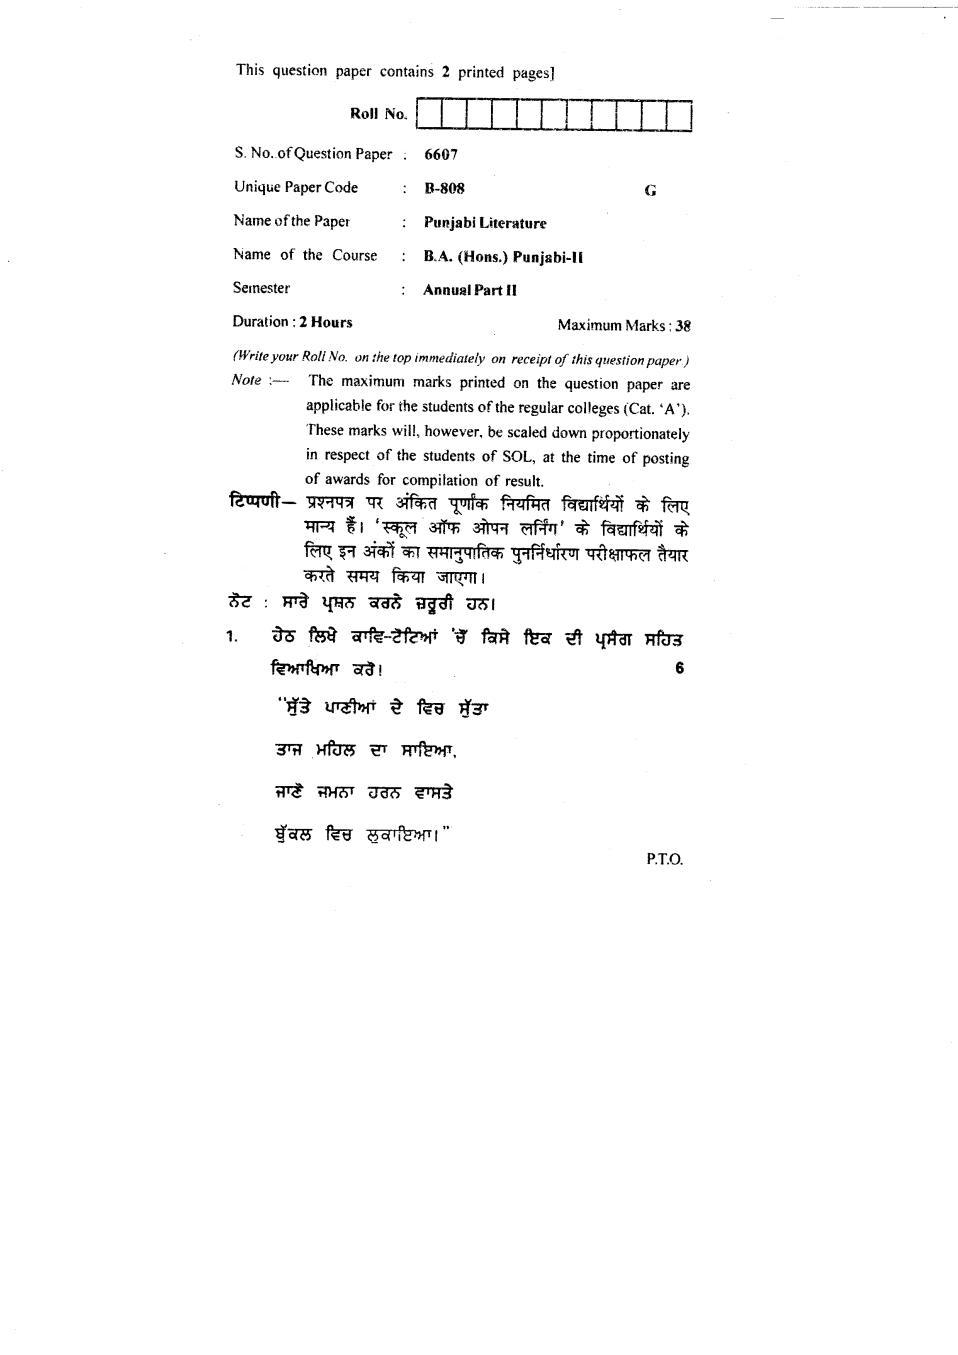 DU SOL Question Paper 2018 BA (Hons.) Punjabi - Punjabi Literature - Page 1